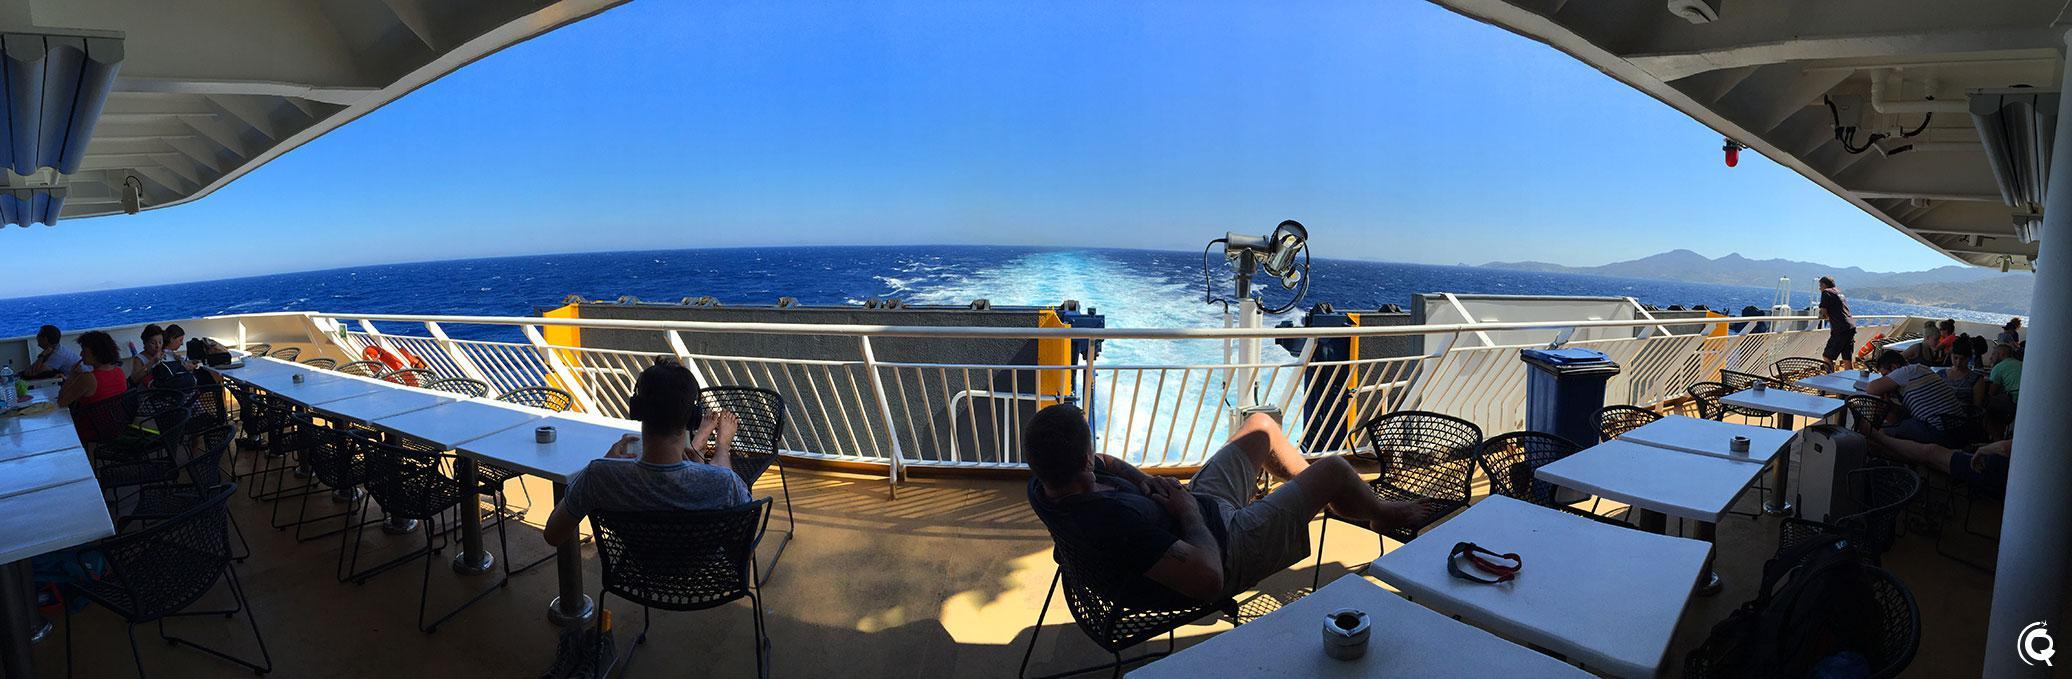 Direction Santorin avec Blue Star Ferries